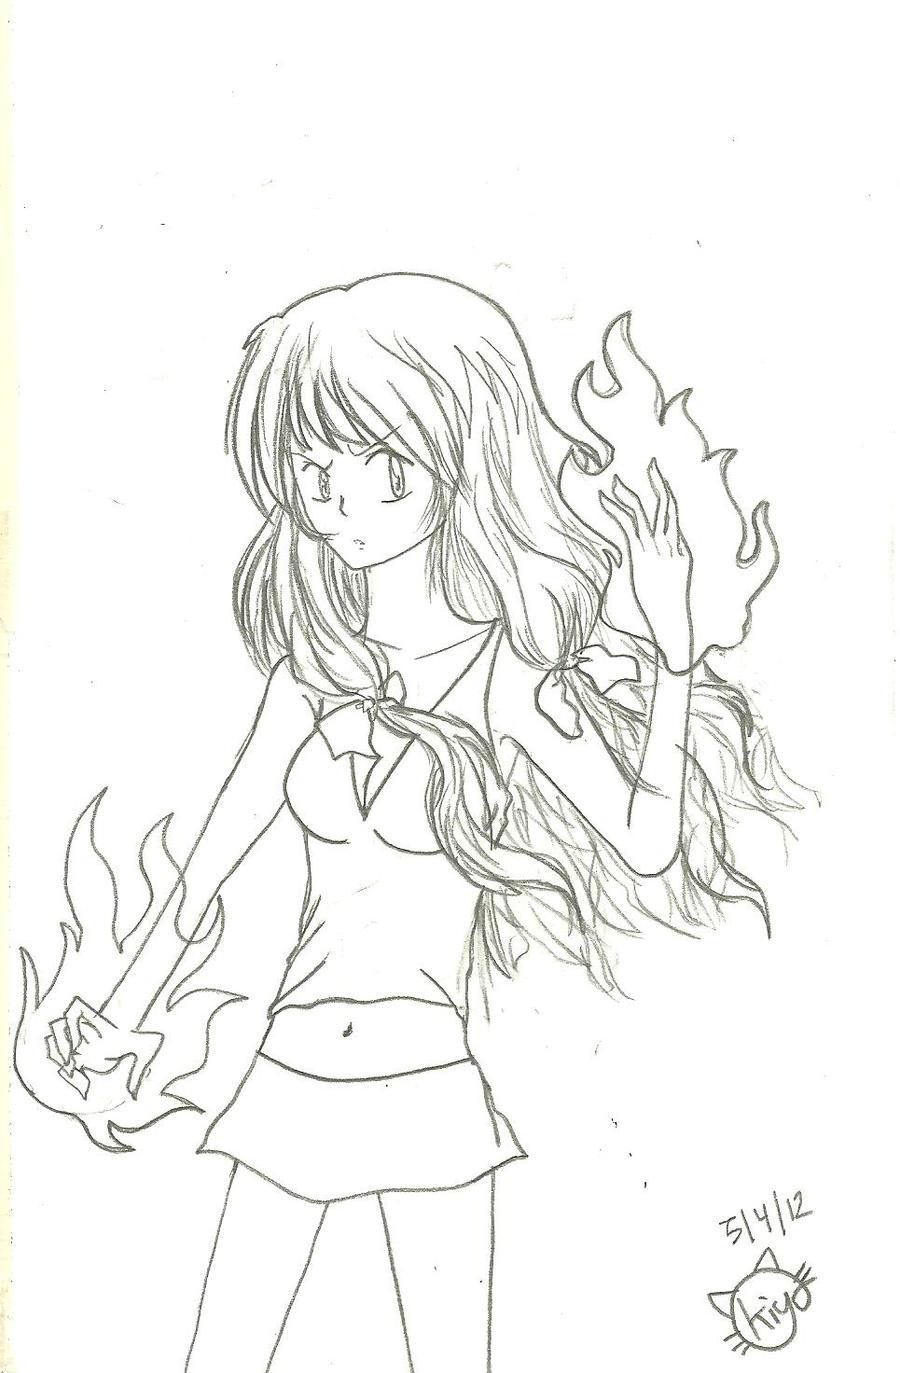 kyoko fire by KiyaSparleVampire